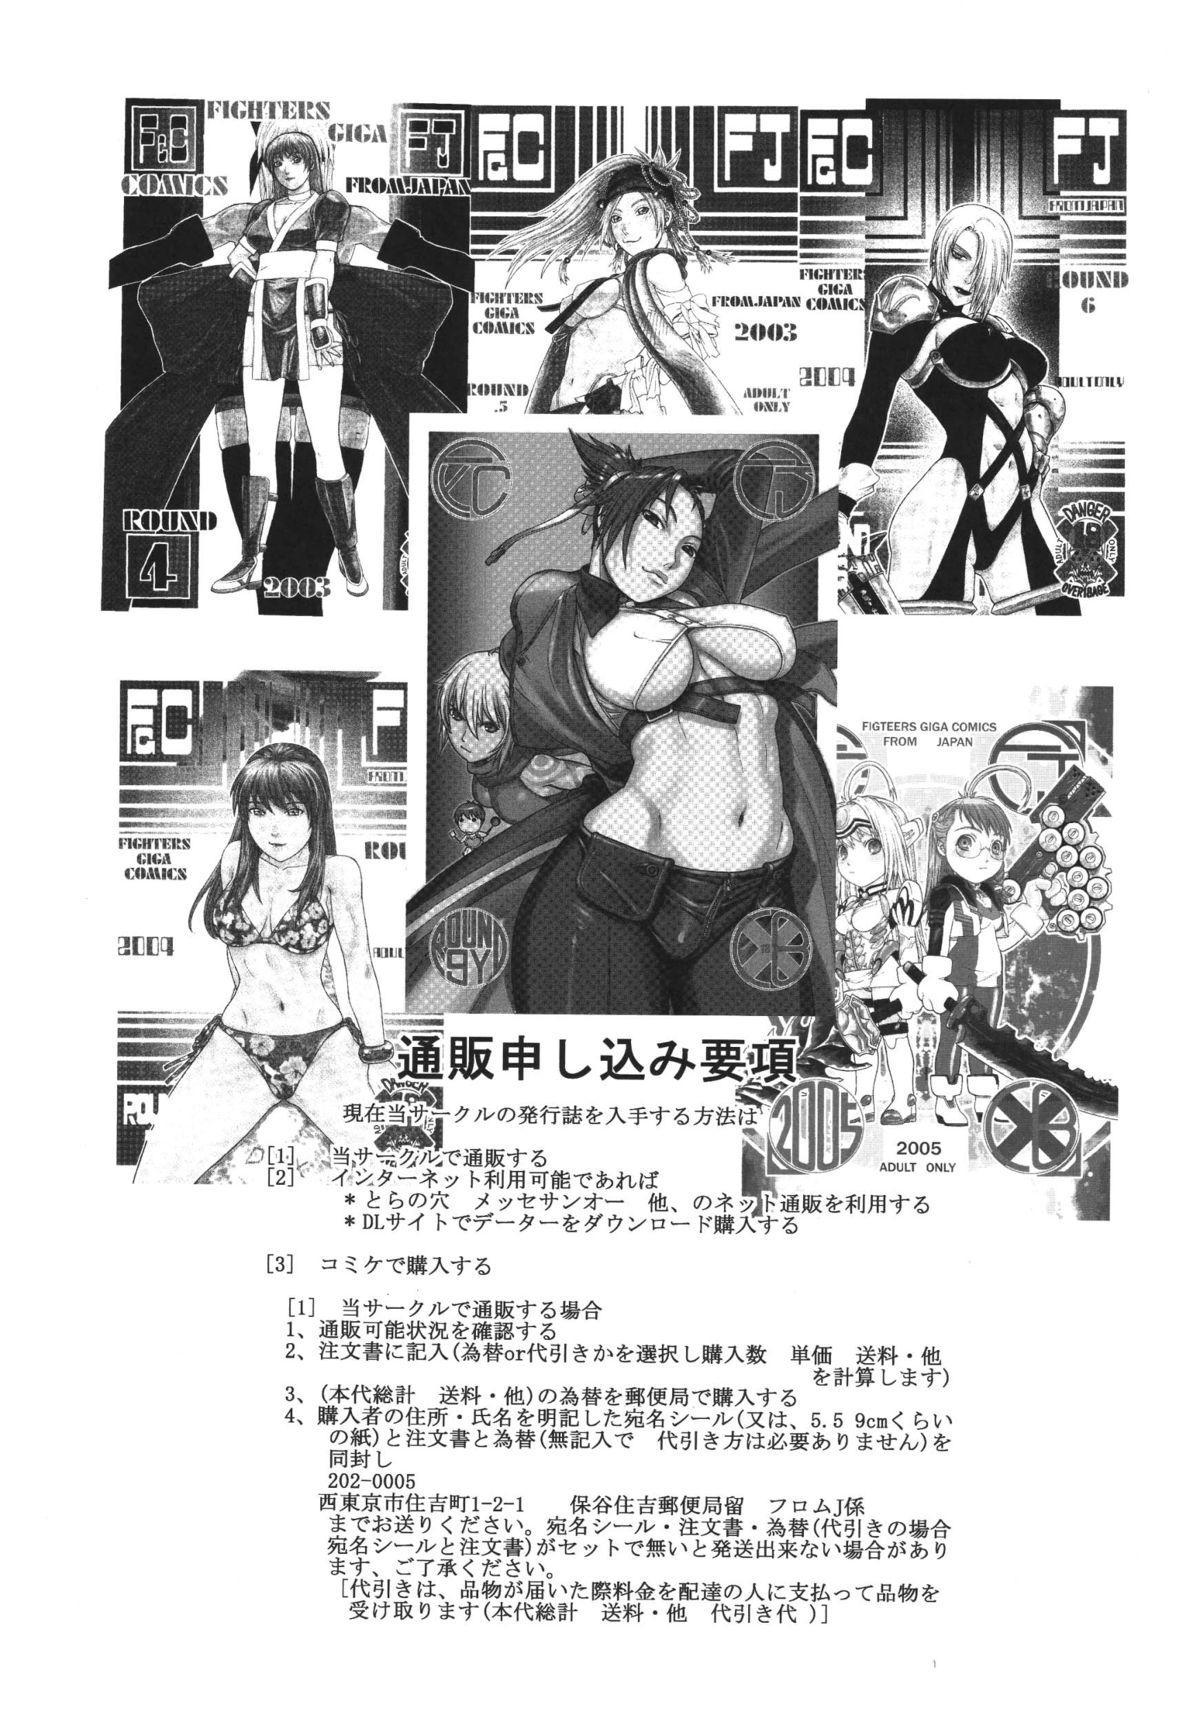 Fighters Yotta Comics Round 10 Yotta 63